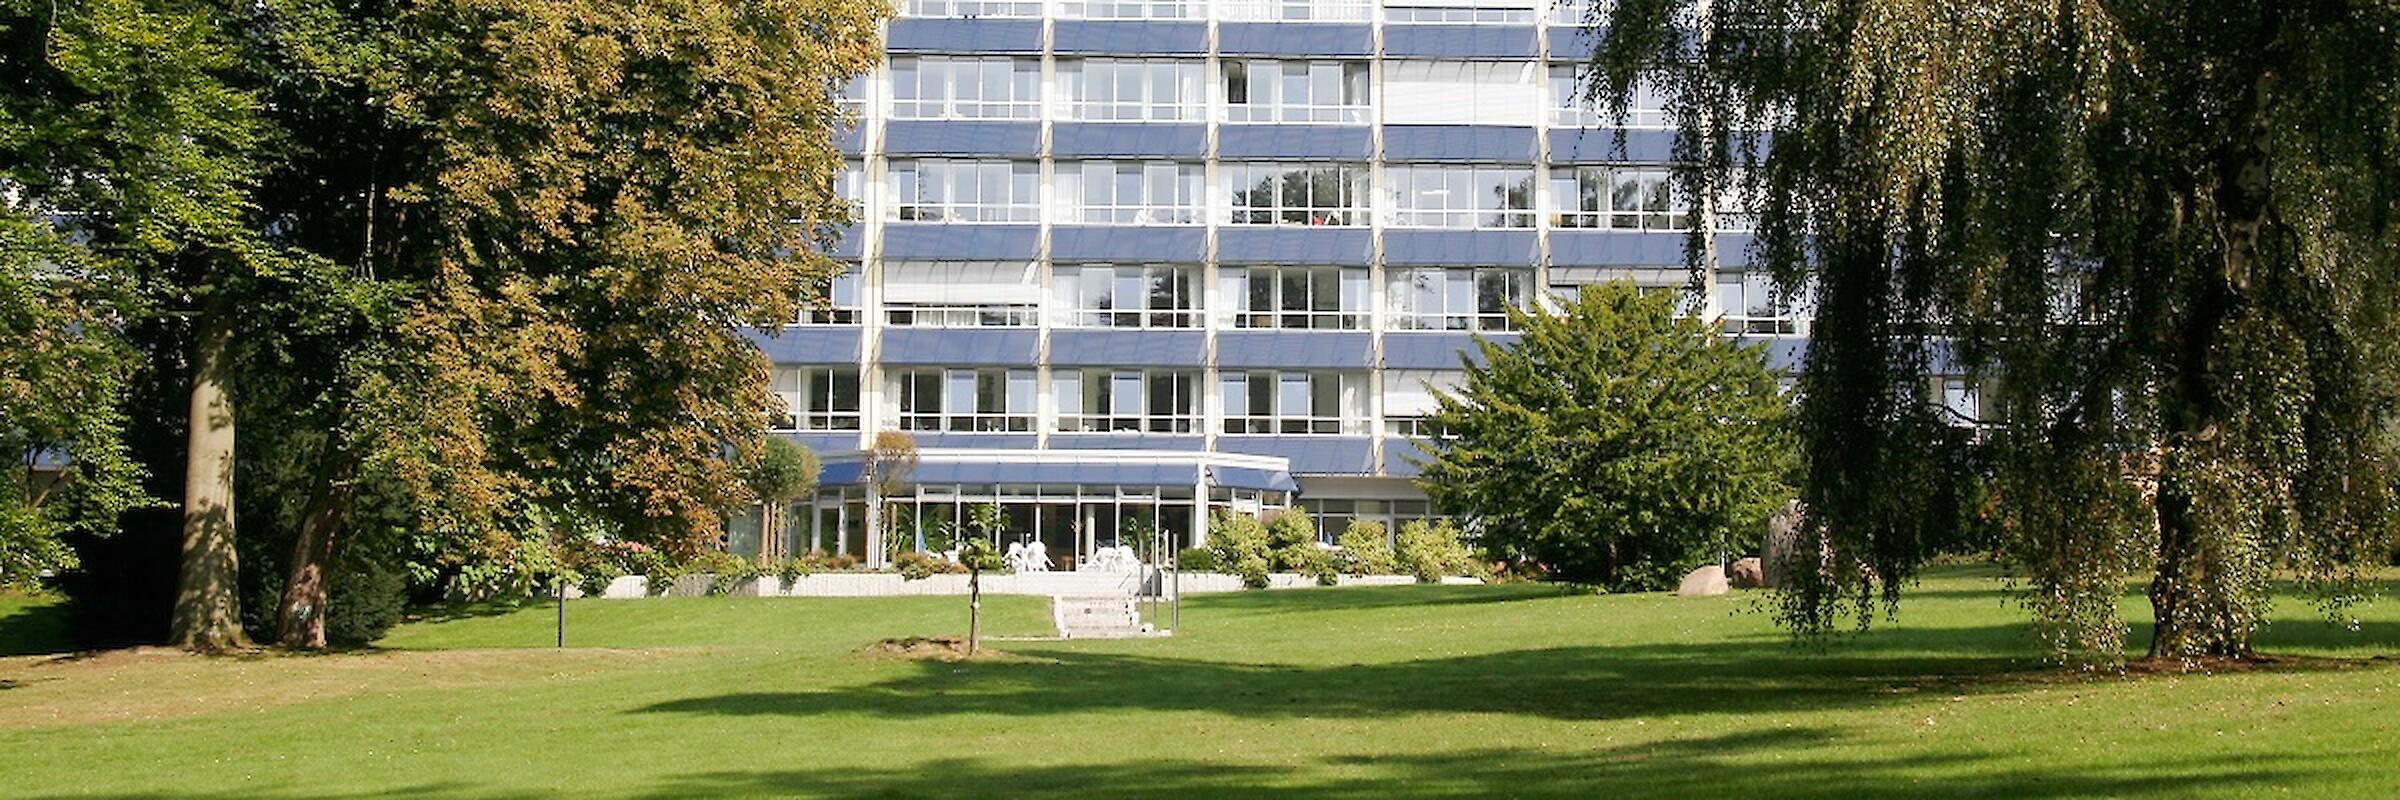 Großhansdorf Lungenclinic